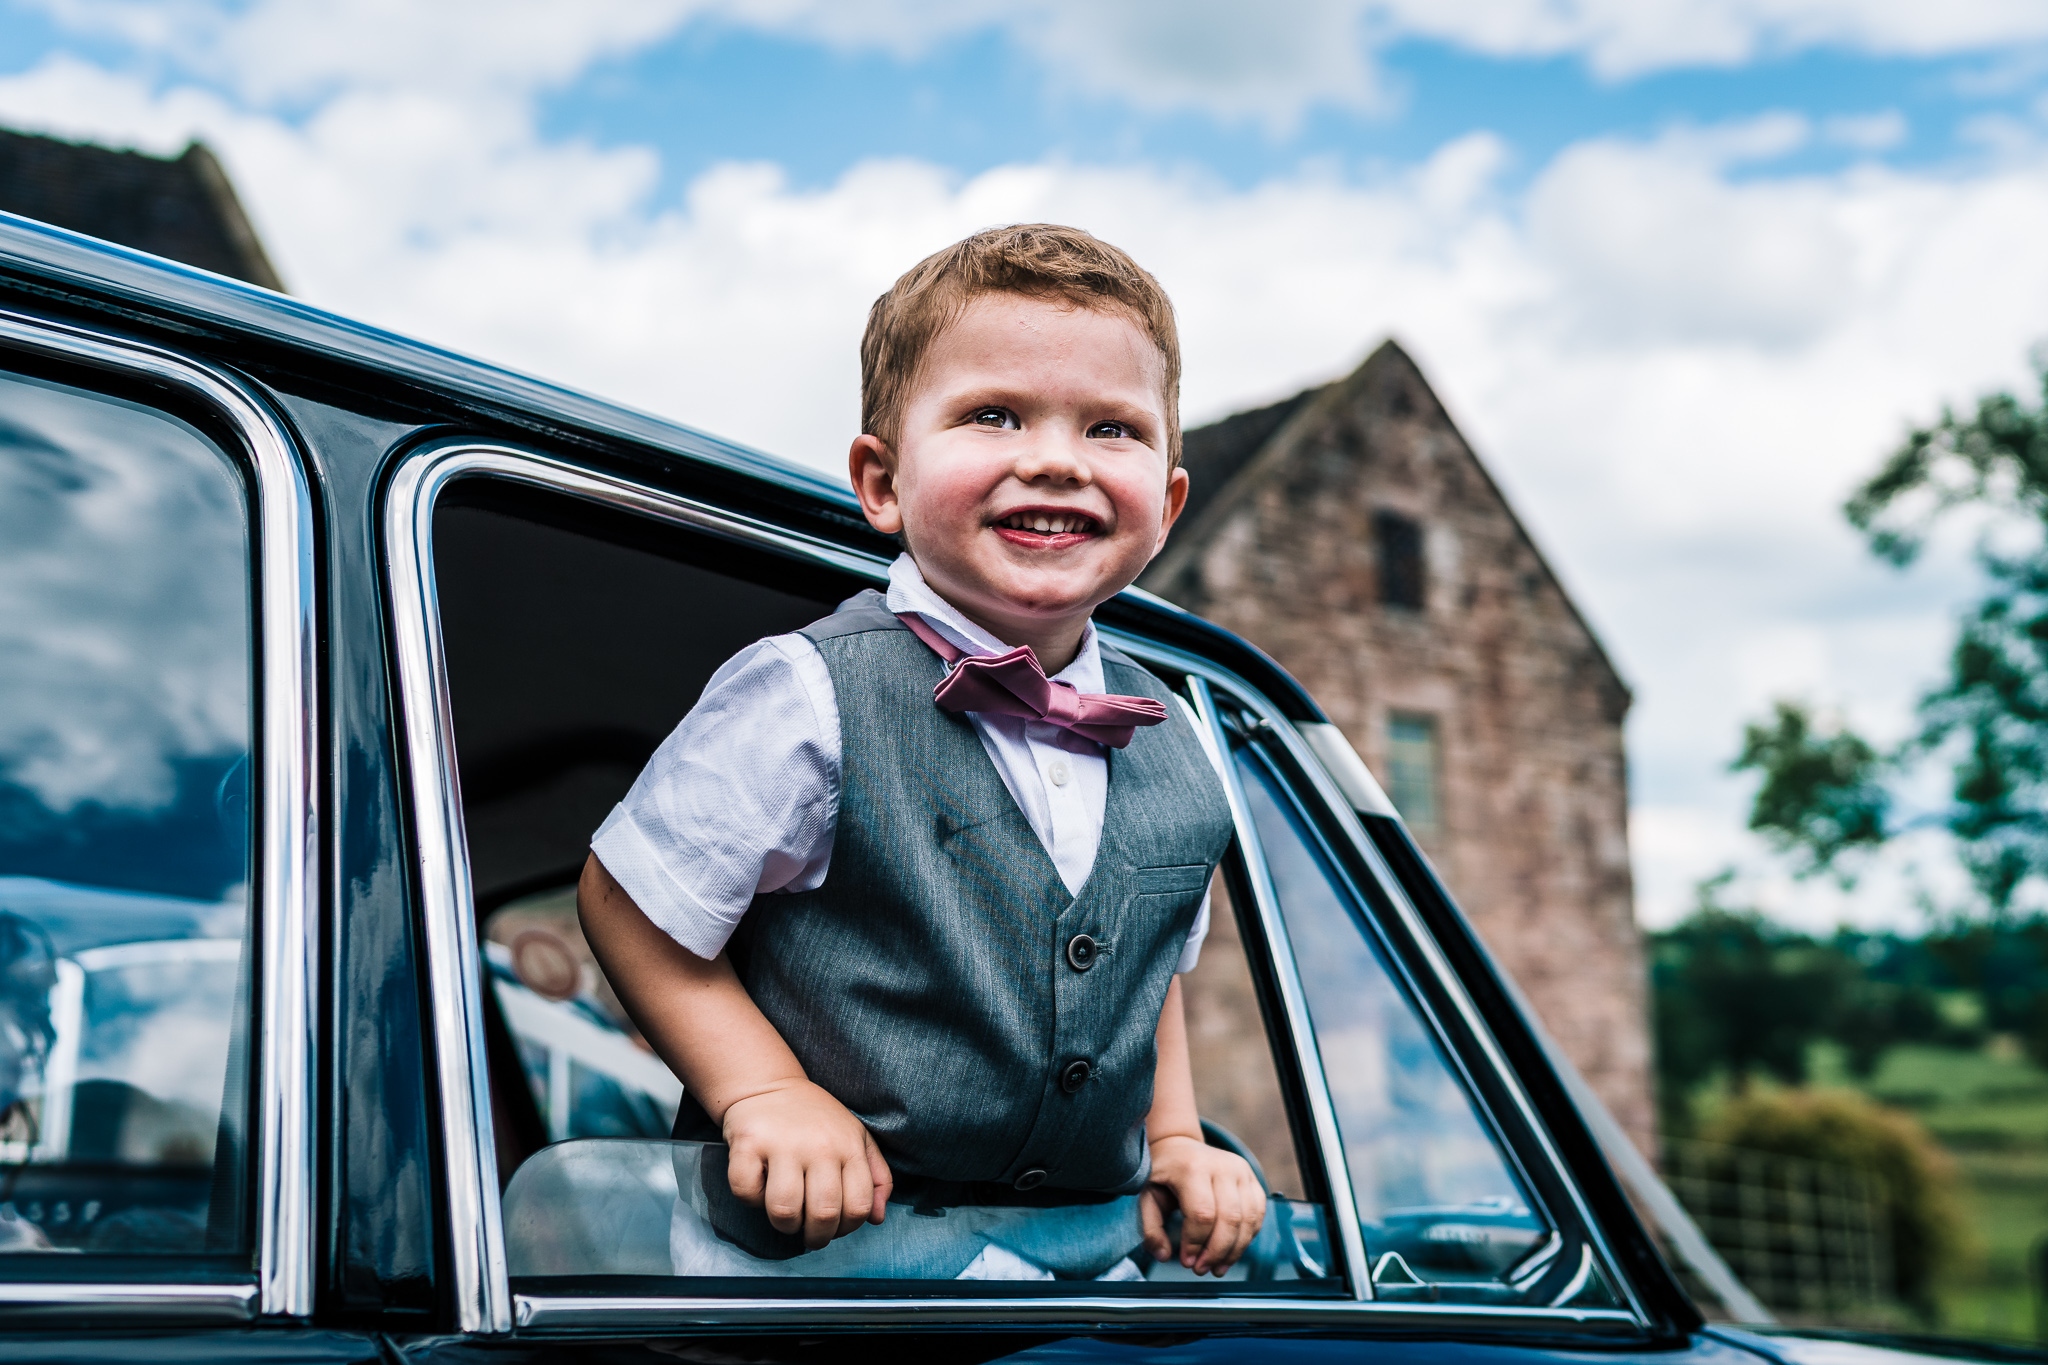 LITTLE BOY AT STAFFORDSHIRE SUMMER WEDDING